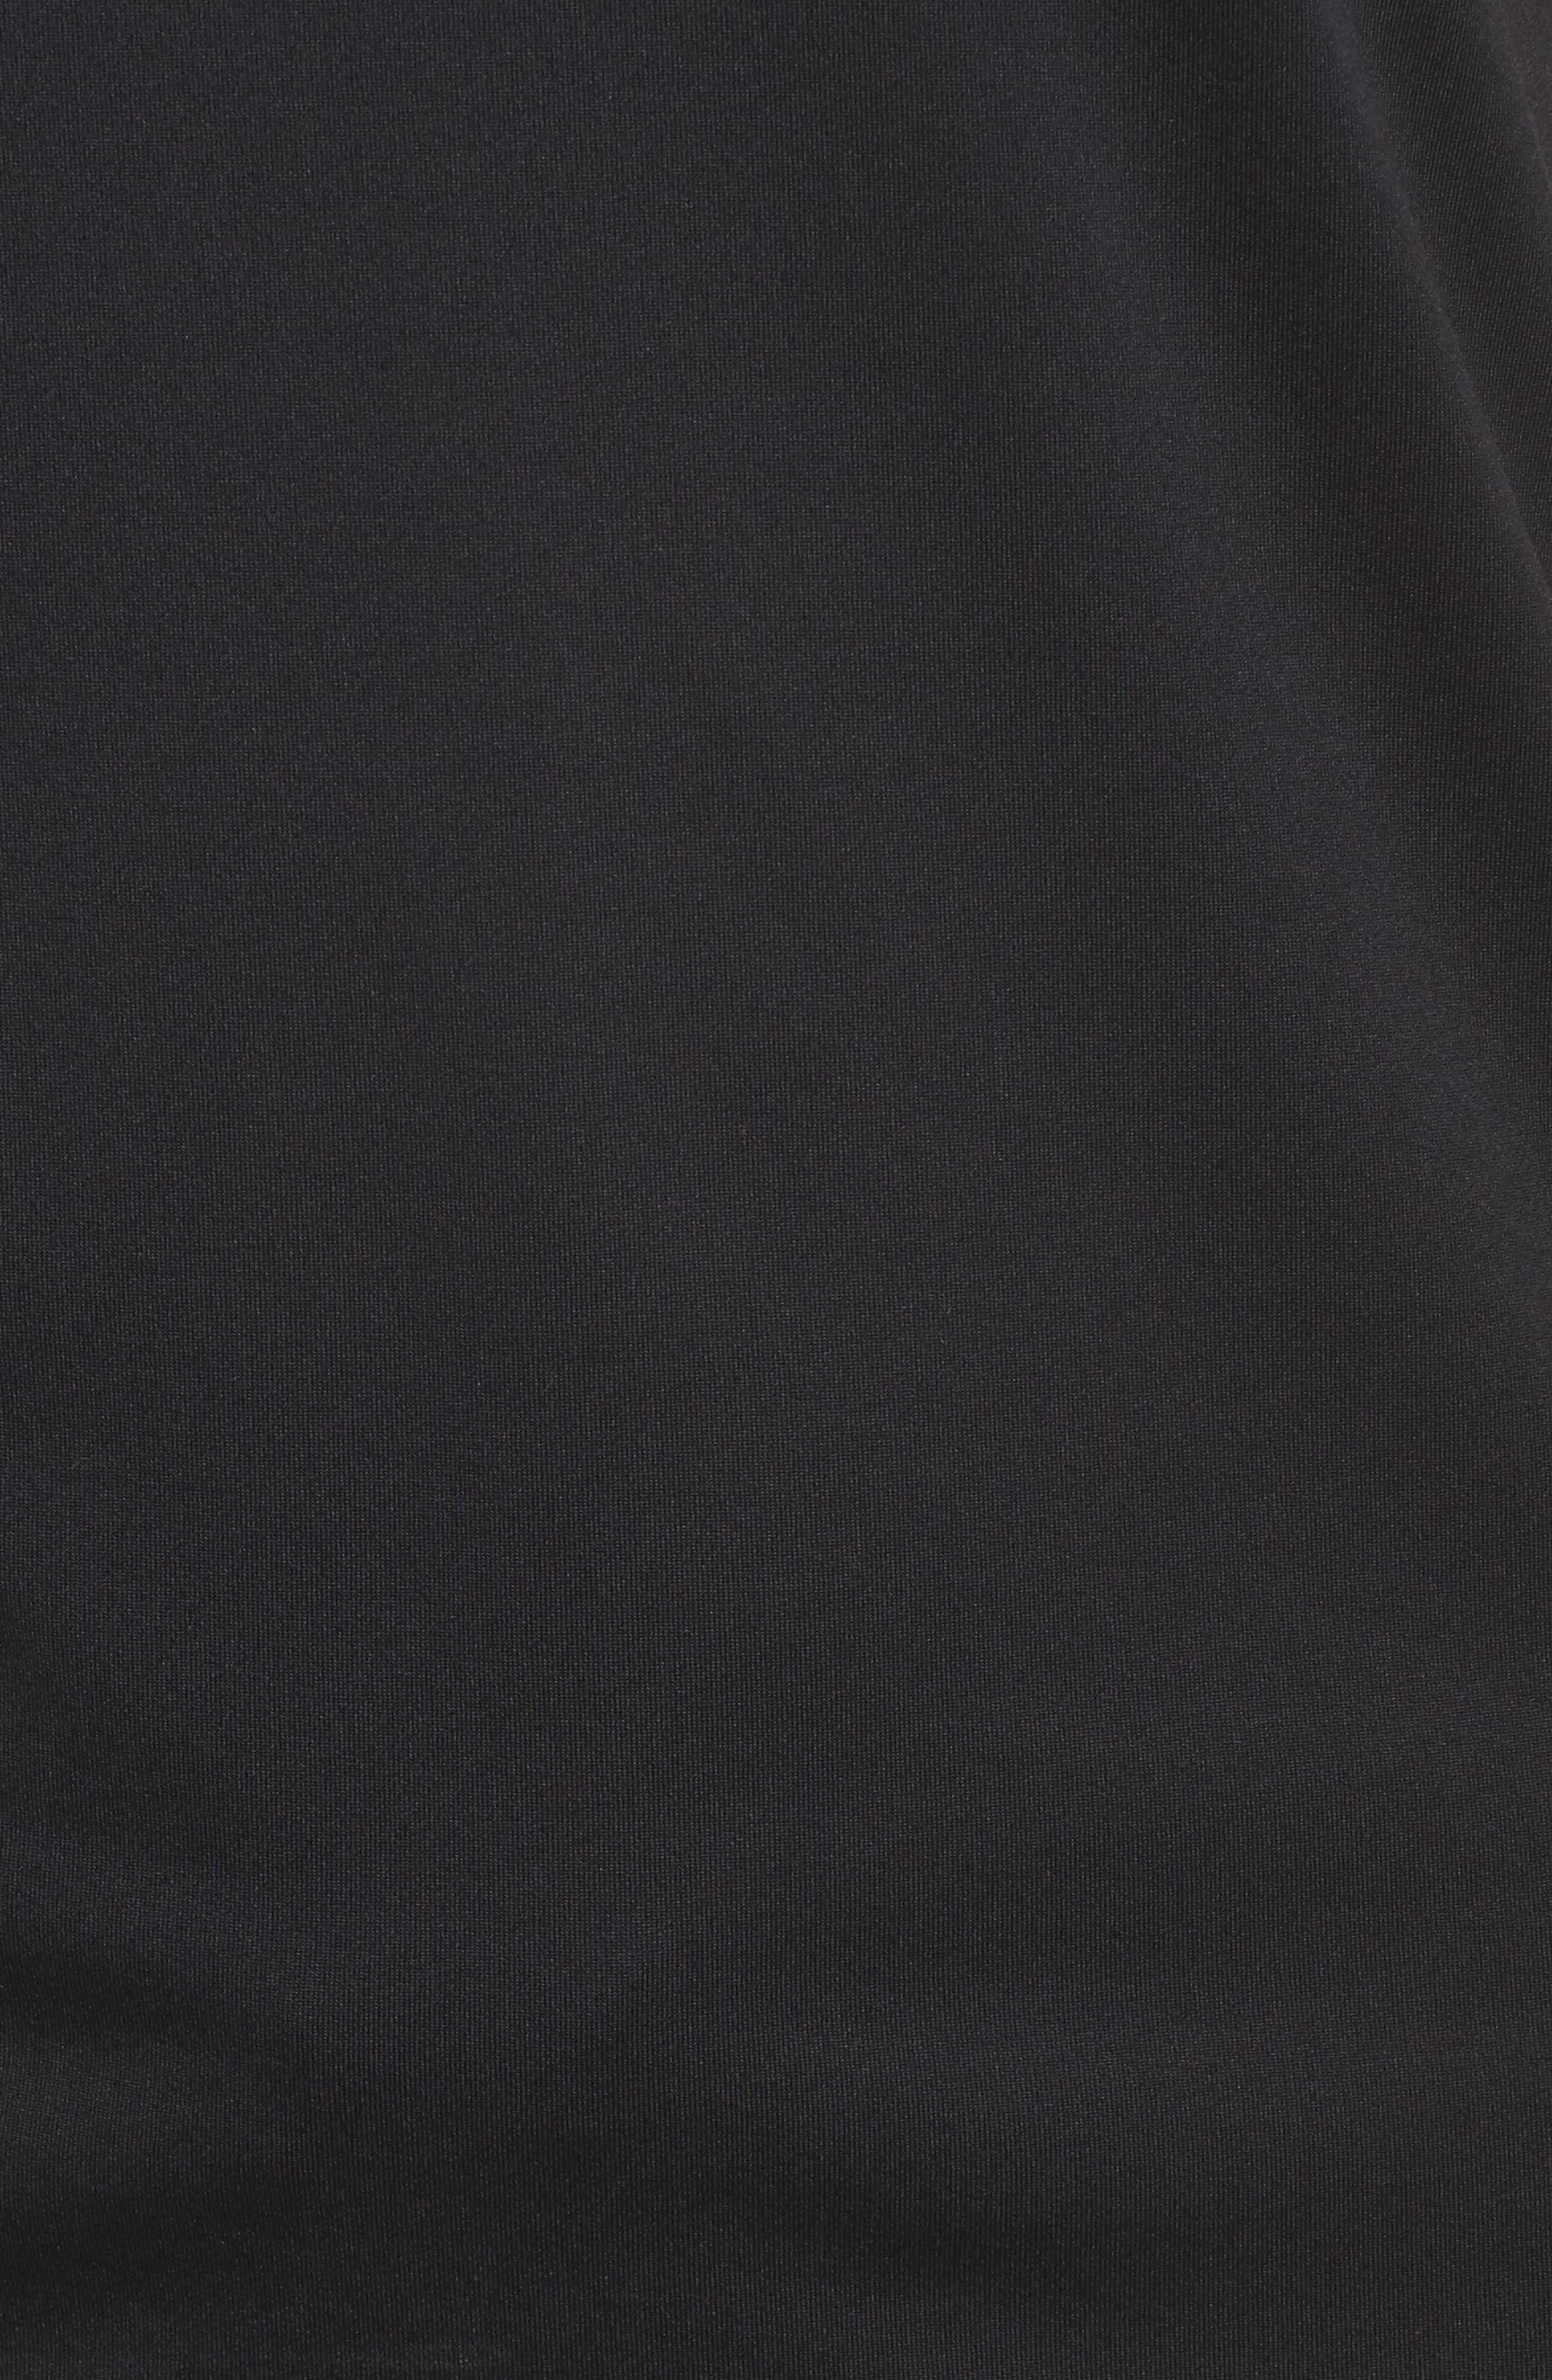 Capilene<sup>®</sup> Dailty T-Shirt,                             Alternate thumbnail 6, color,                             001